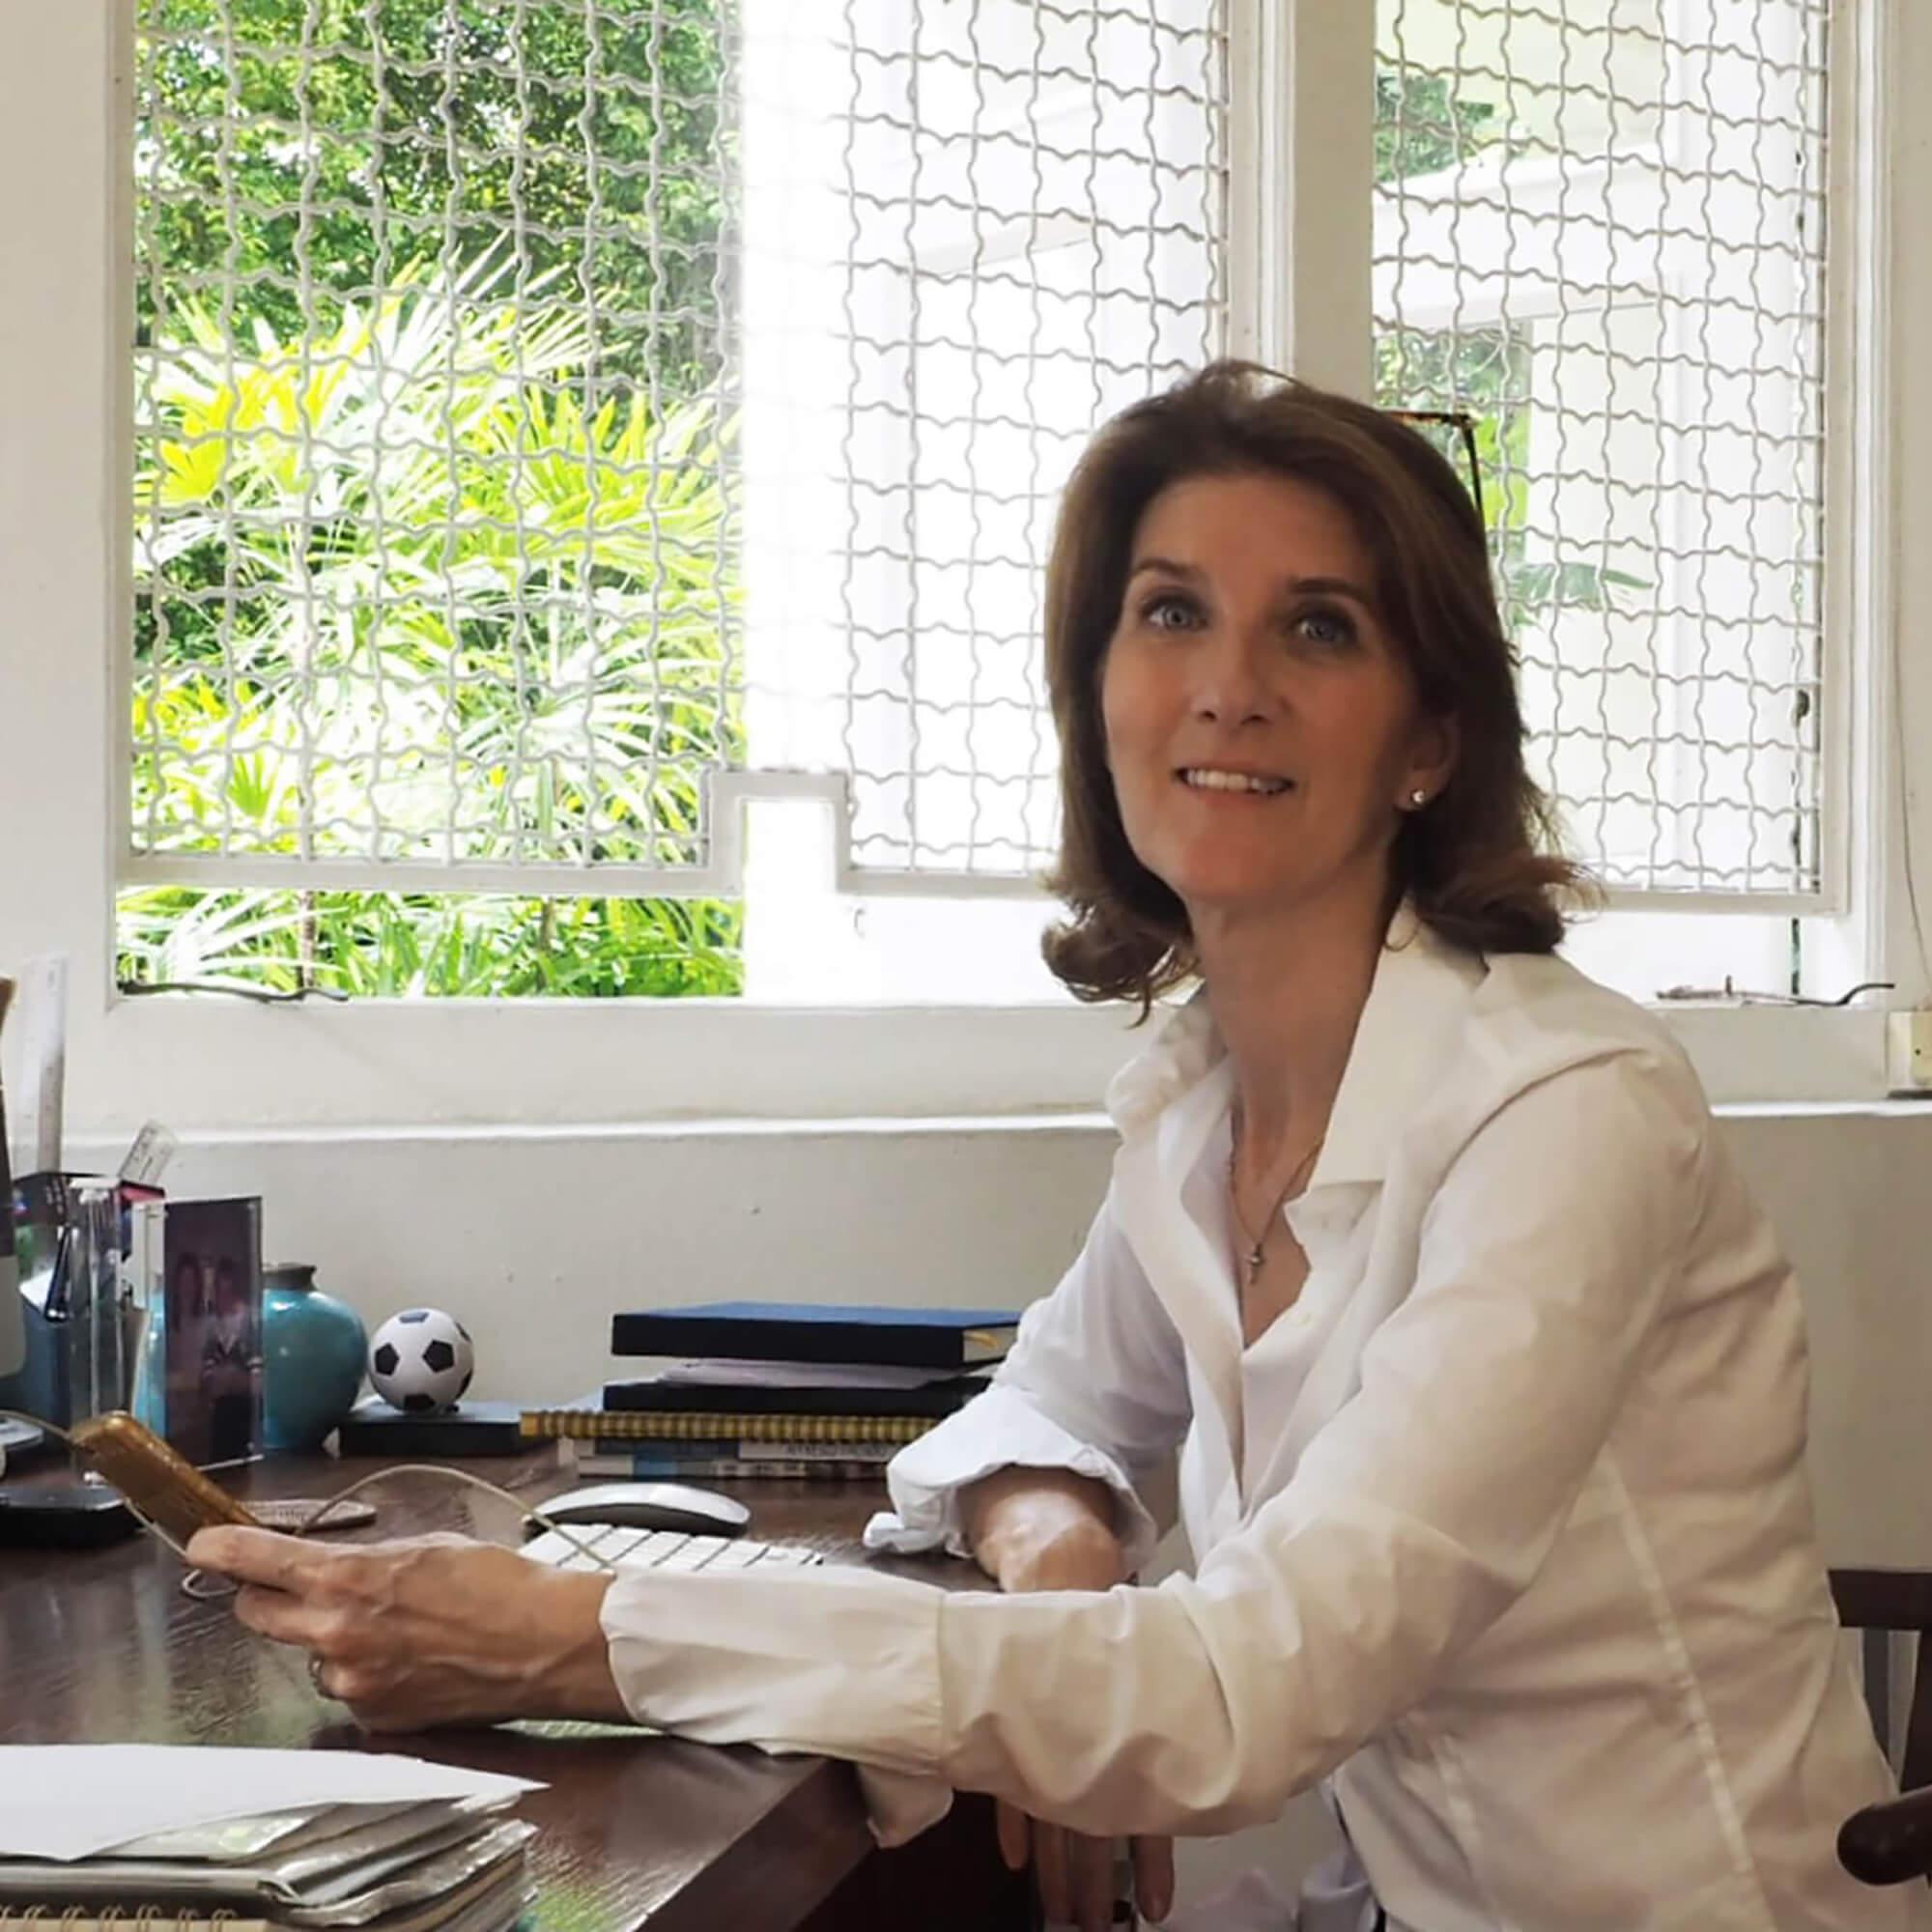 Fiona Henderson sat at her desk